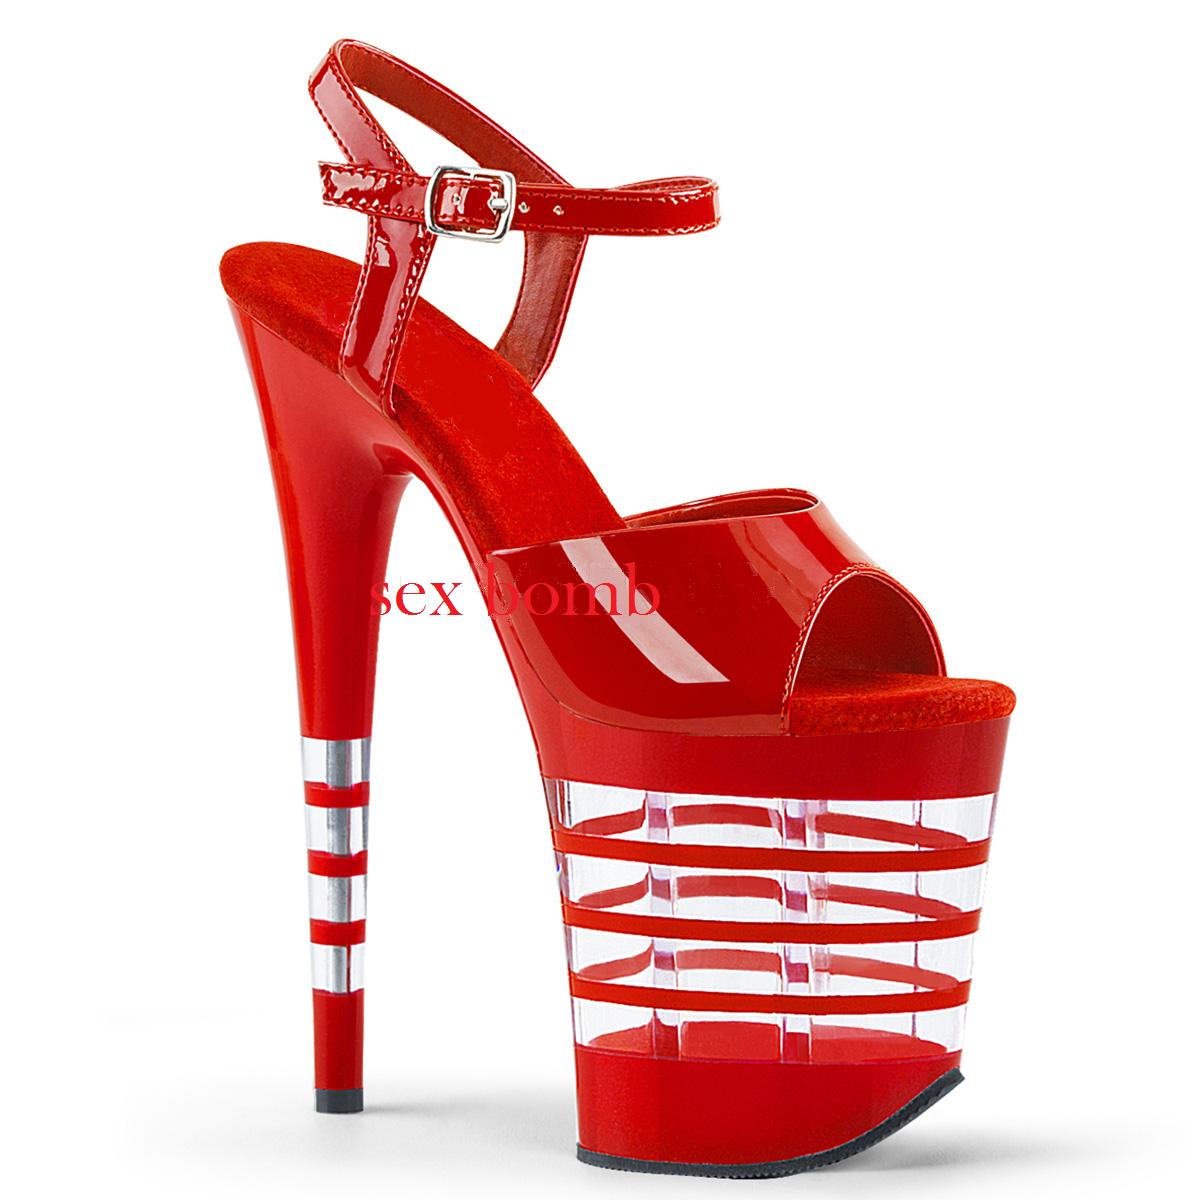 Sexy SANDALI tacco 20 dal 35 al 40 rouge plateau cinturino chaussures GLAMOUR Club